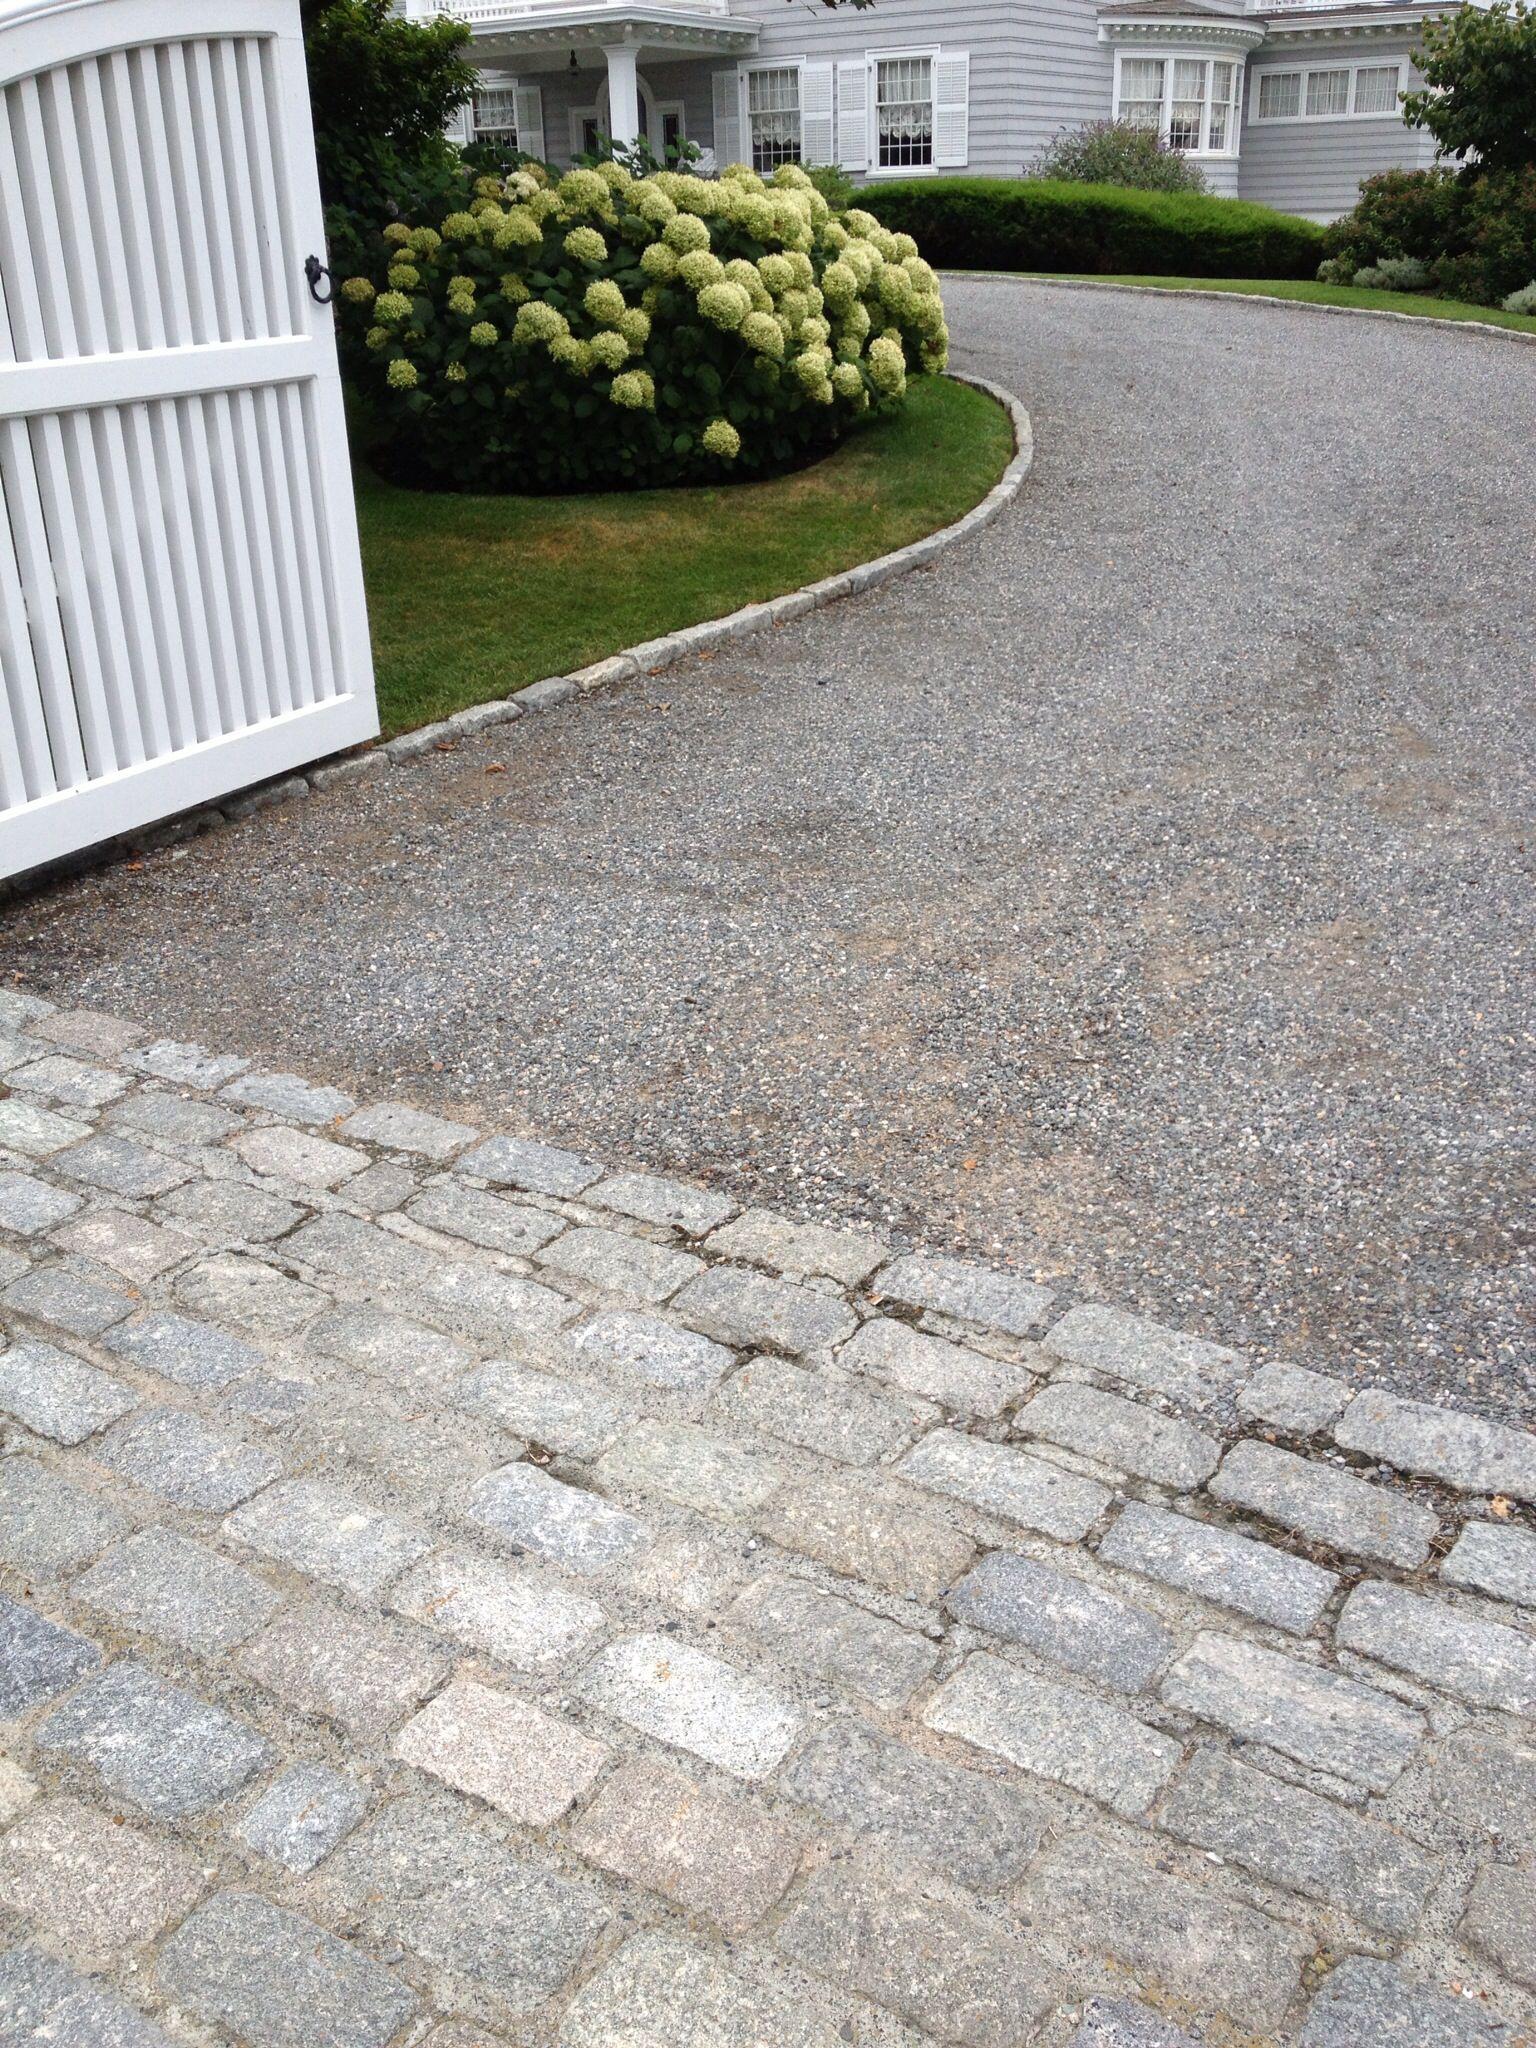 Gravel Driveway Belgian Block Apron Driveway Landscaping